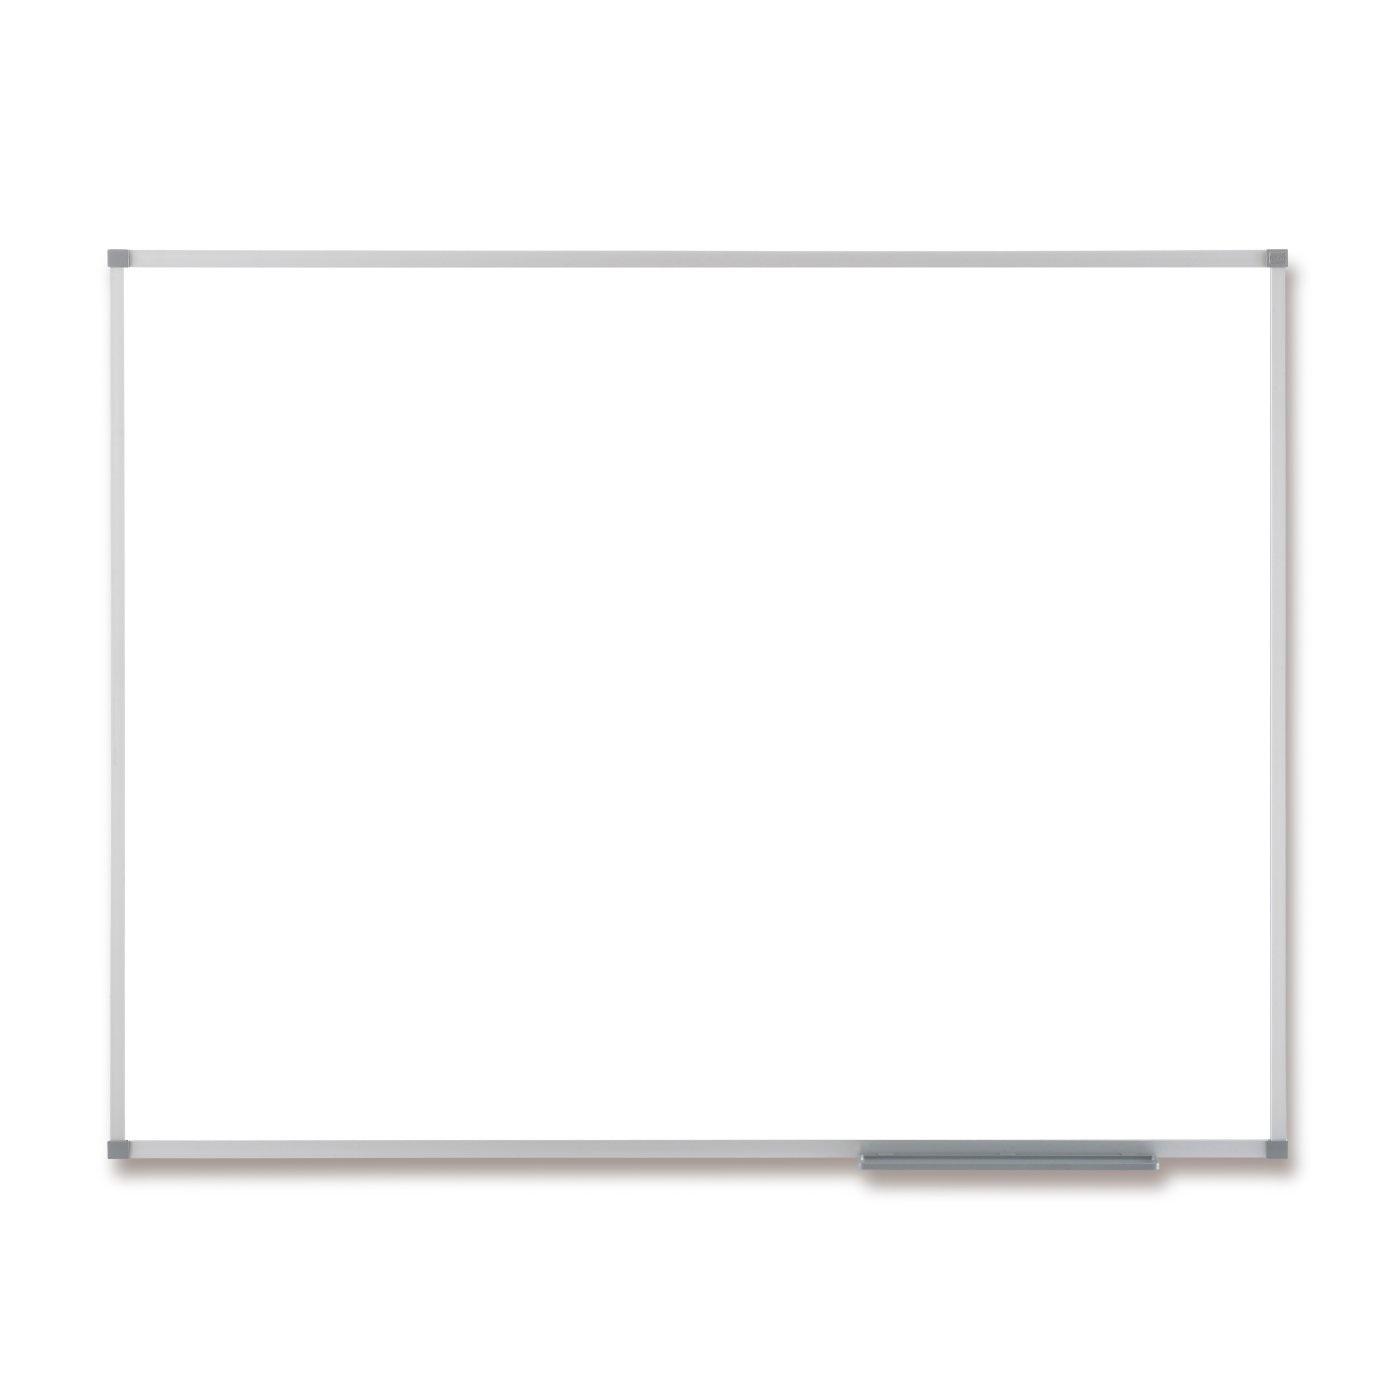 Keramická tabule NOBO CLASSIC Enamel 90x60 cm